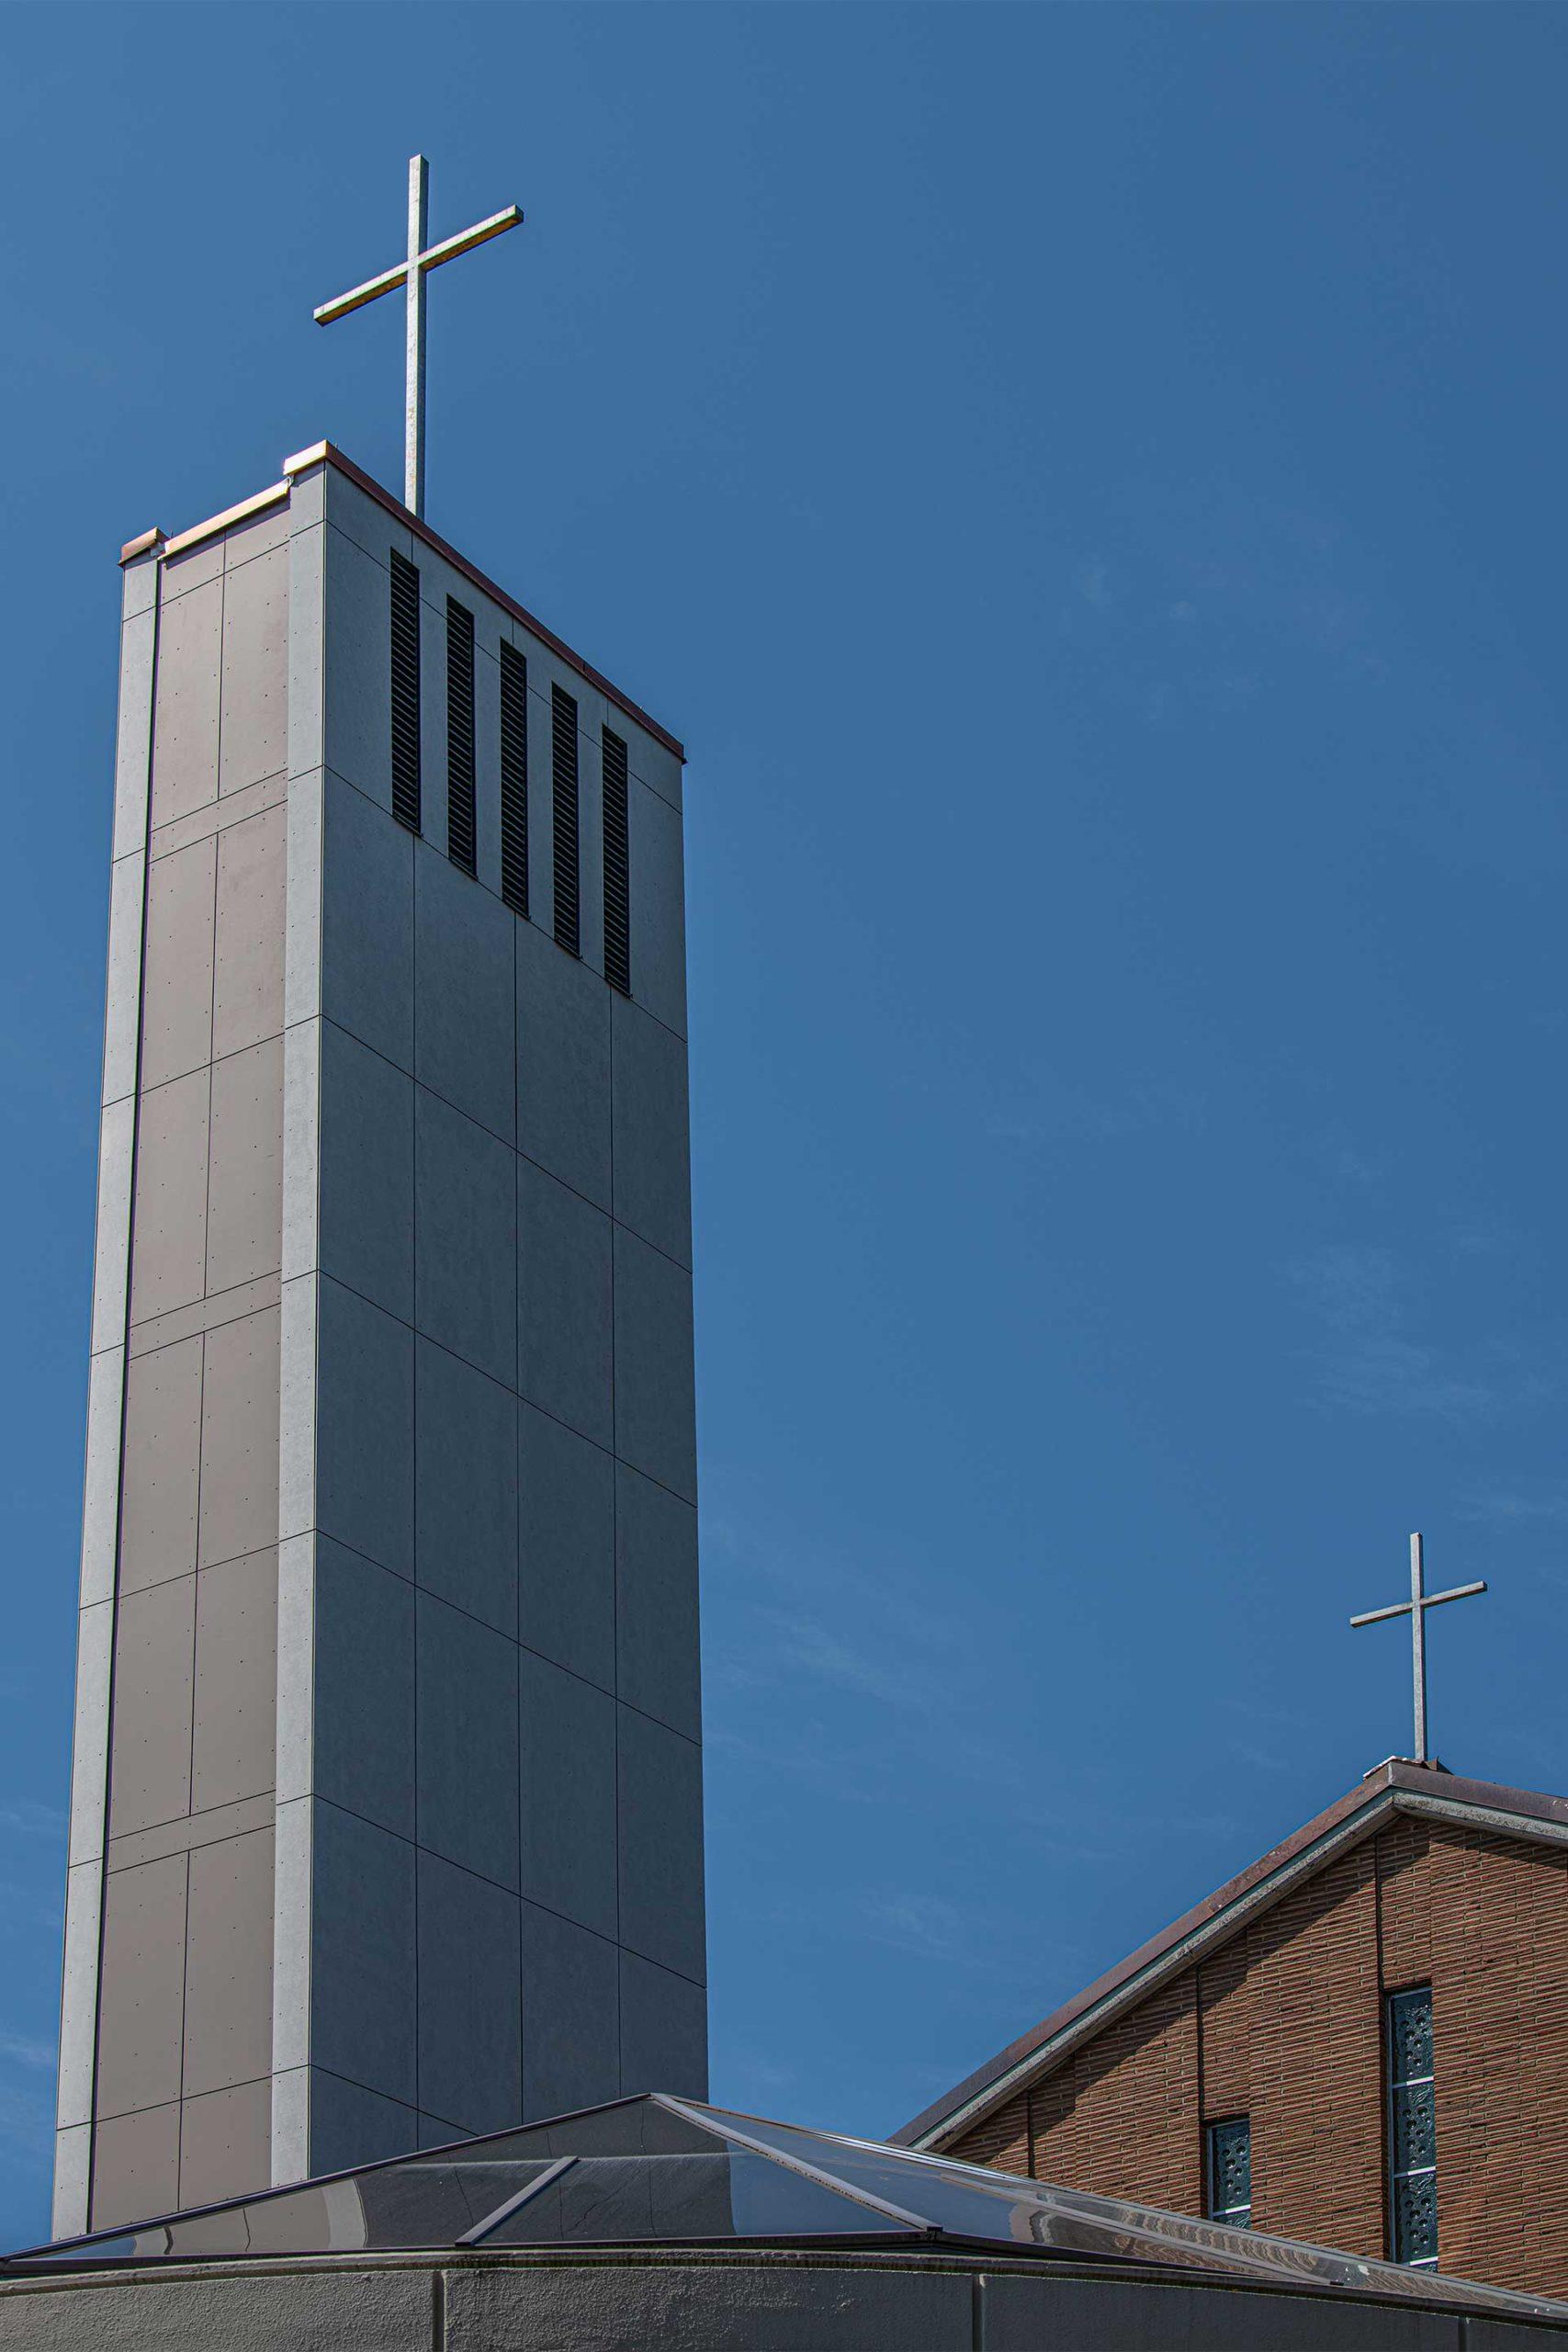 https://www.goudycc.com/wp-content/uploads/2020/12/sacred-heart-church-11-scaled.jpg